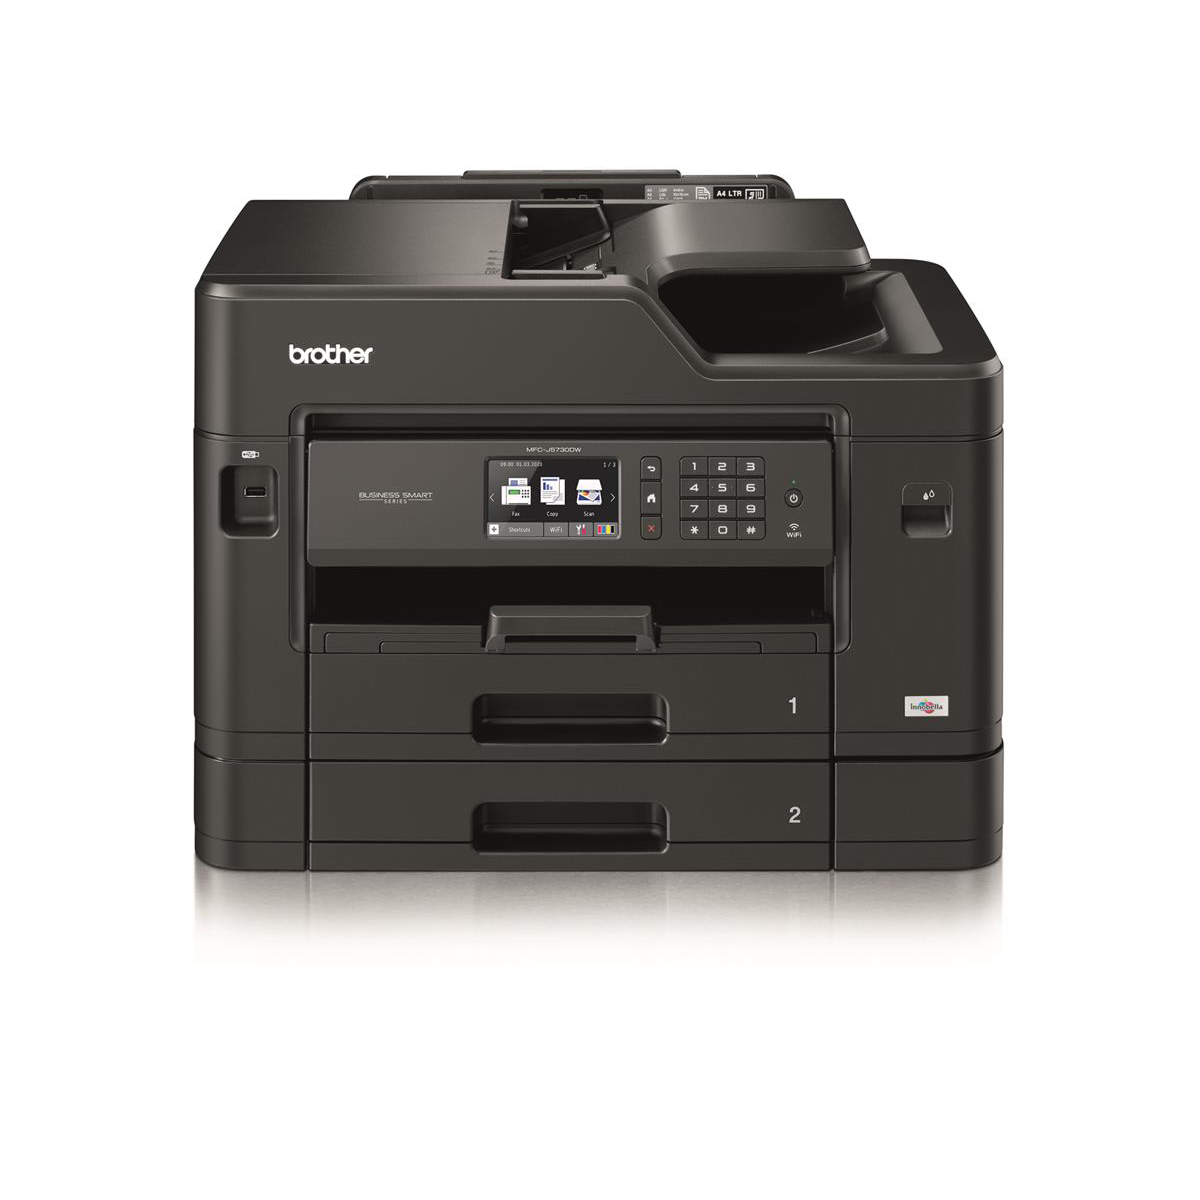 Brother Colour Multifunction Inkjet A4 Printer Ref MFCJ5730DWZU1